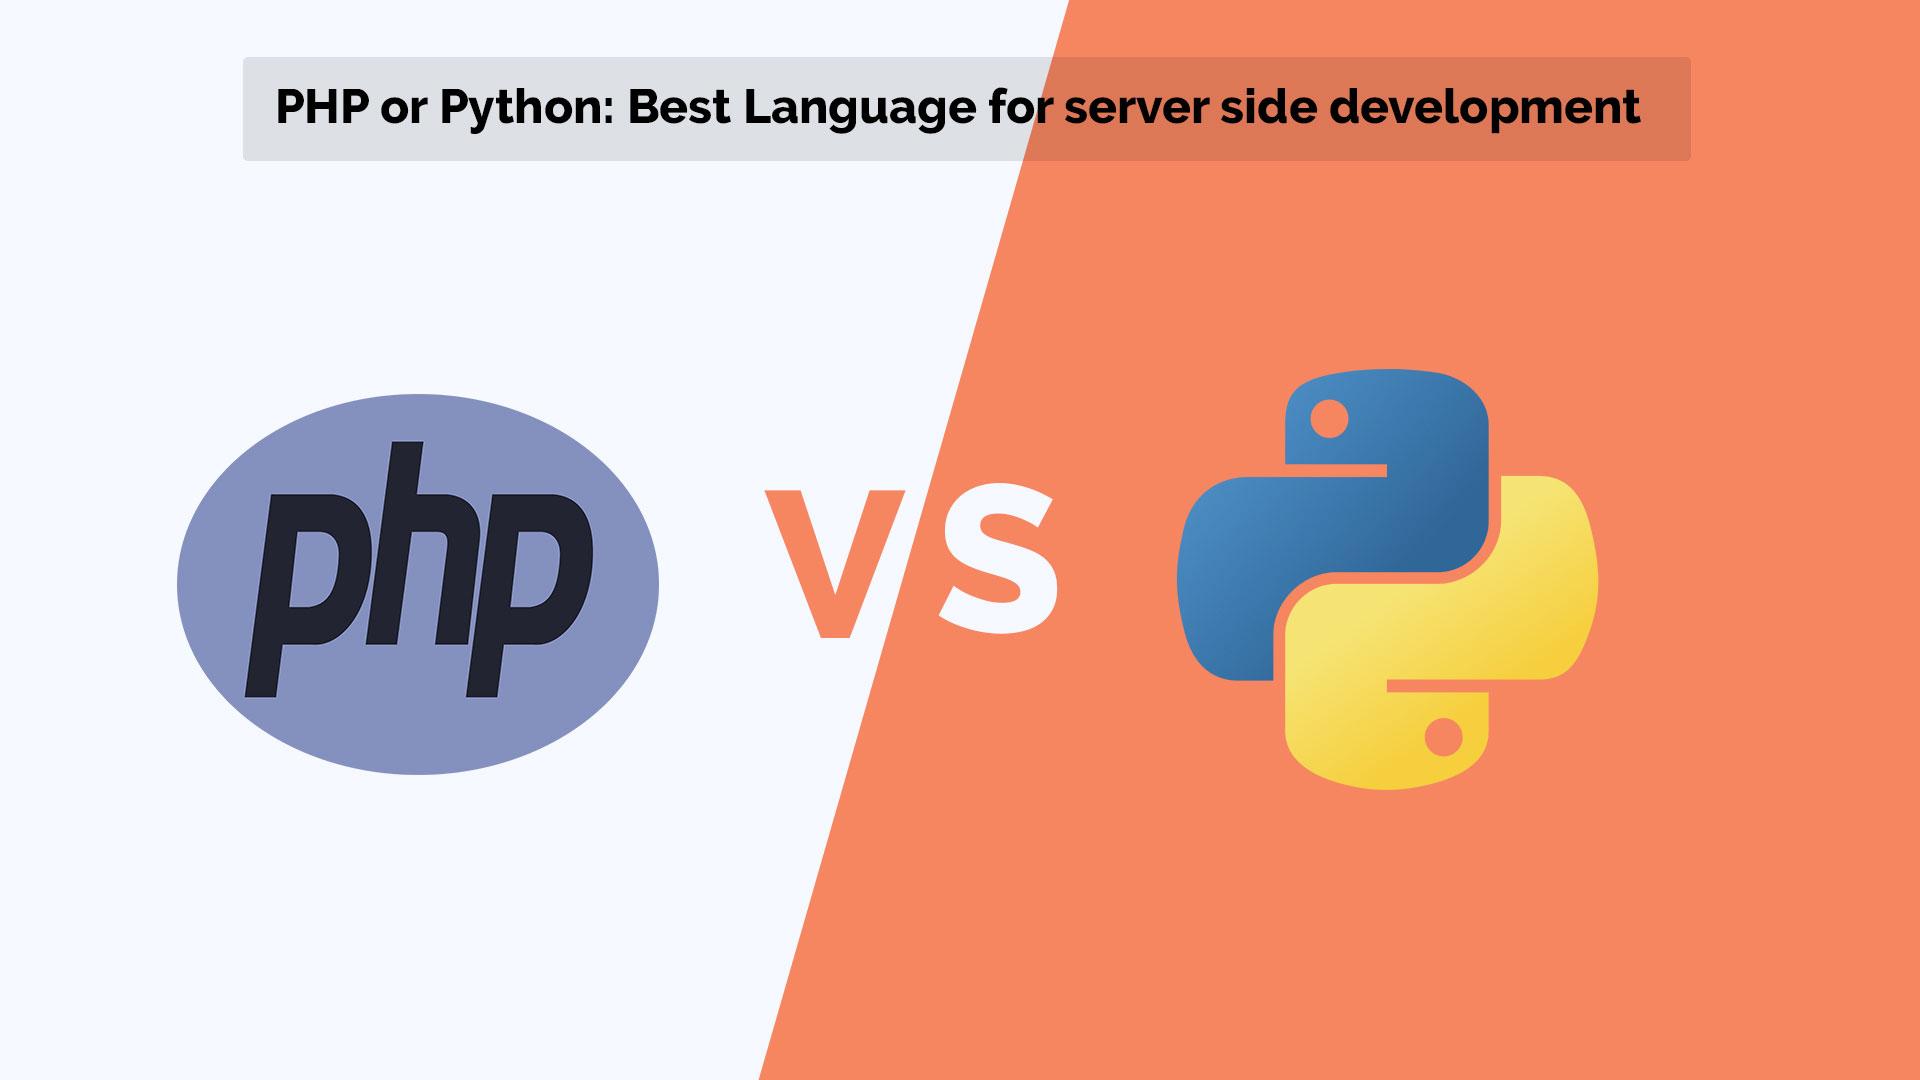 PHP or Python: Best Language for server side development